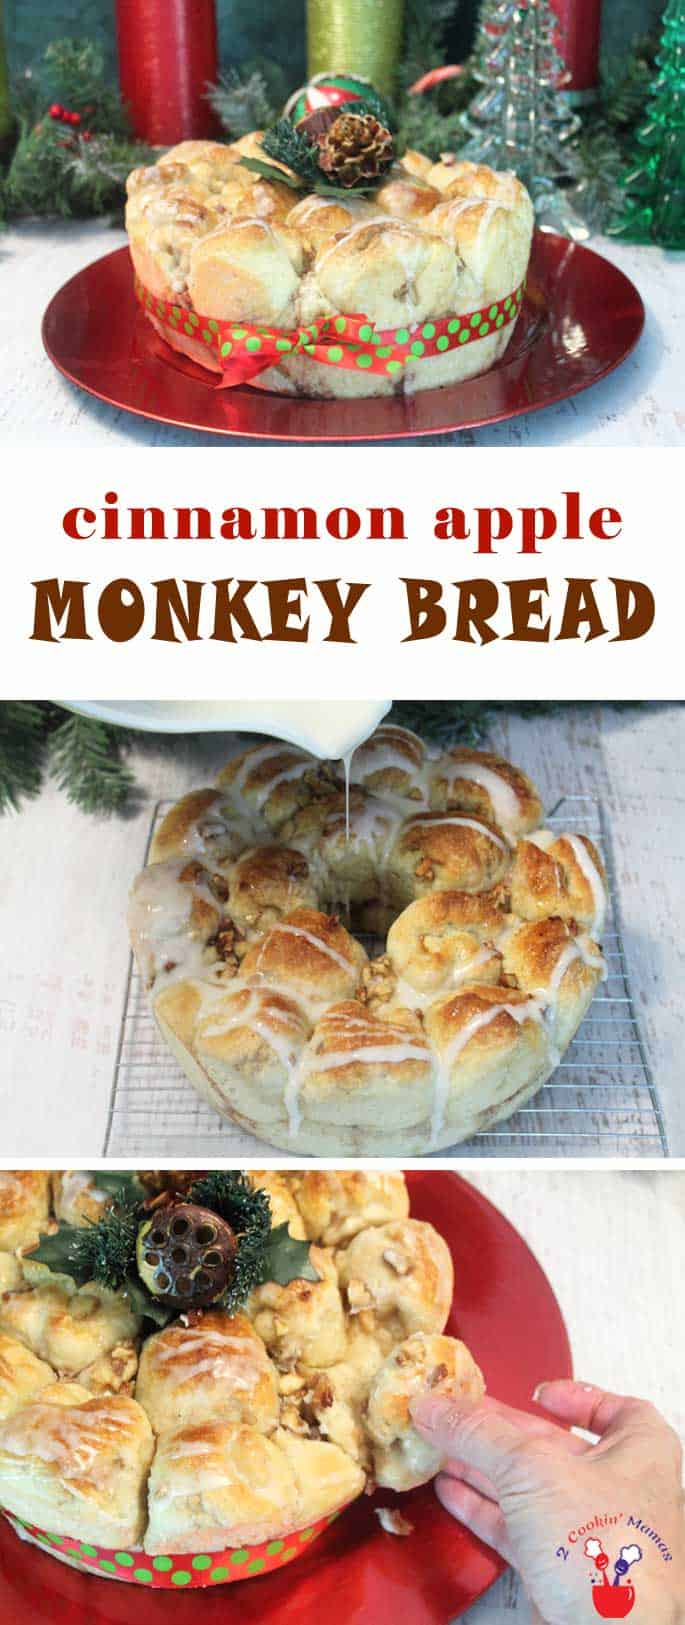 Cinnamon Apple Monkey Bread | 2 Cookin Mamas Little balls of sweet dough filled with cinnamon apples and pecans make this cinnamon apple monkey bread a breakfast favorite. #recipe